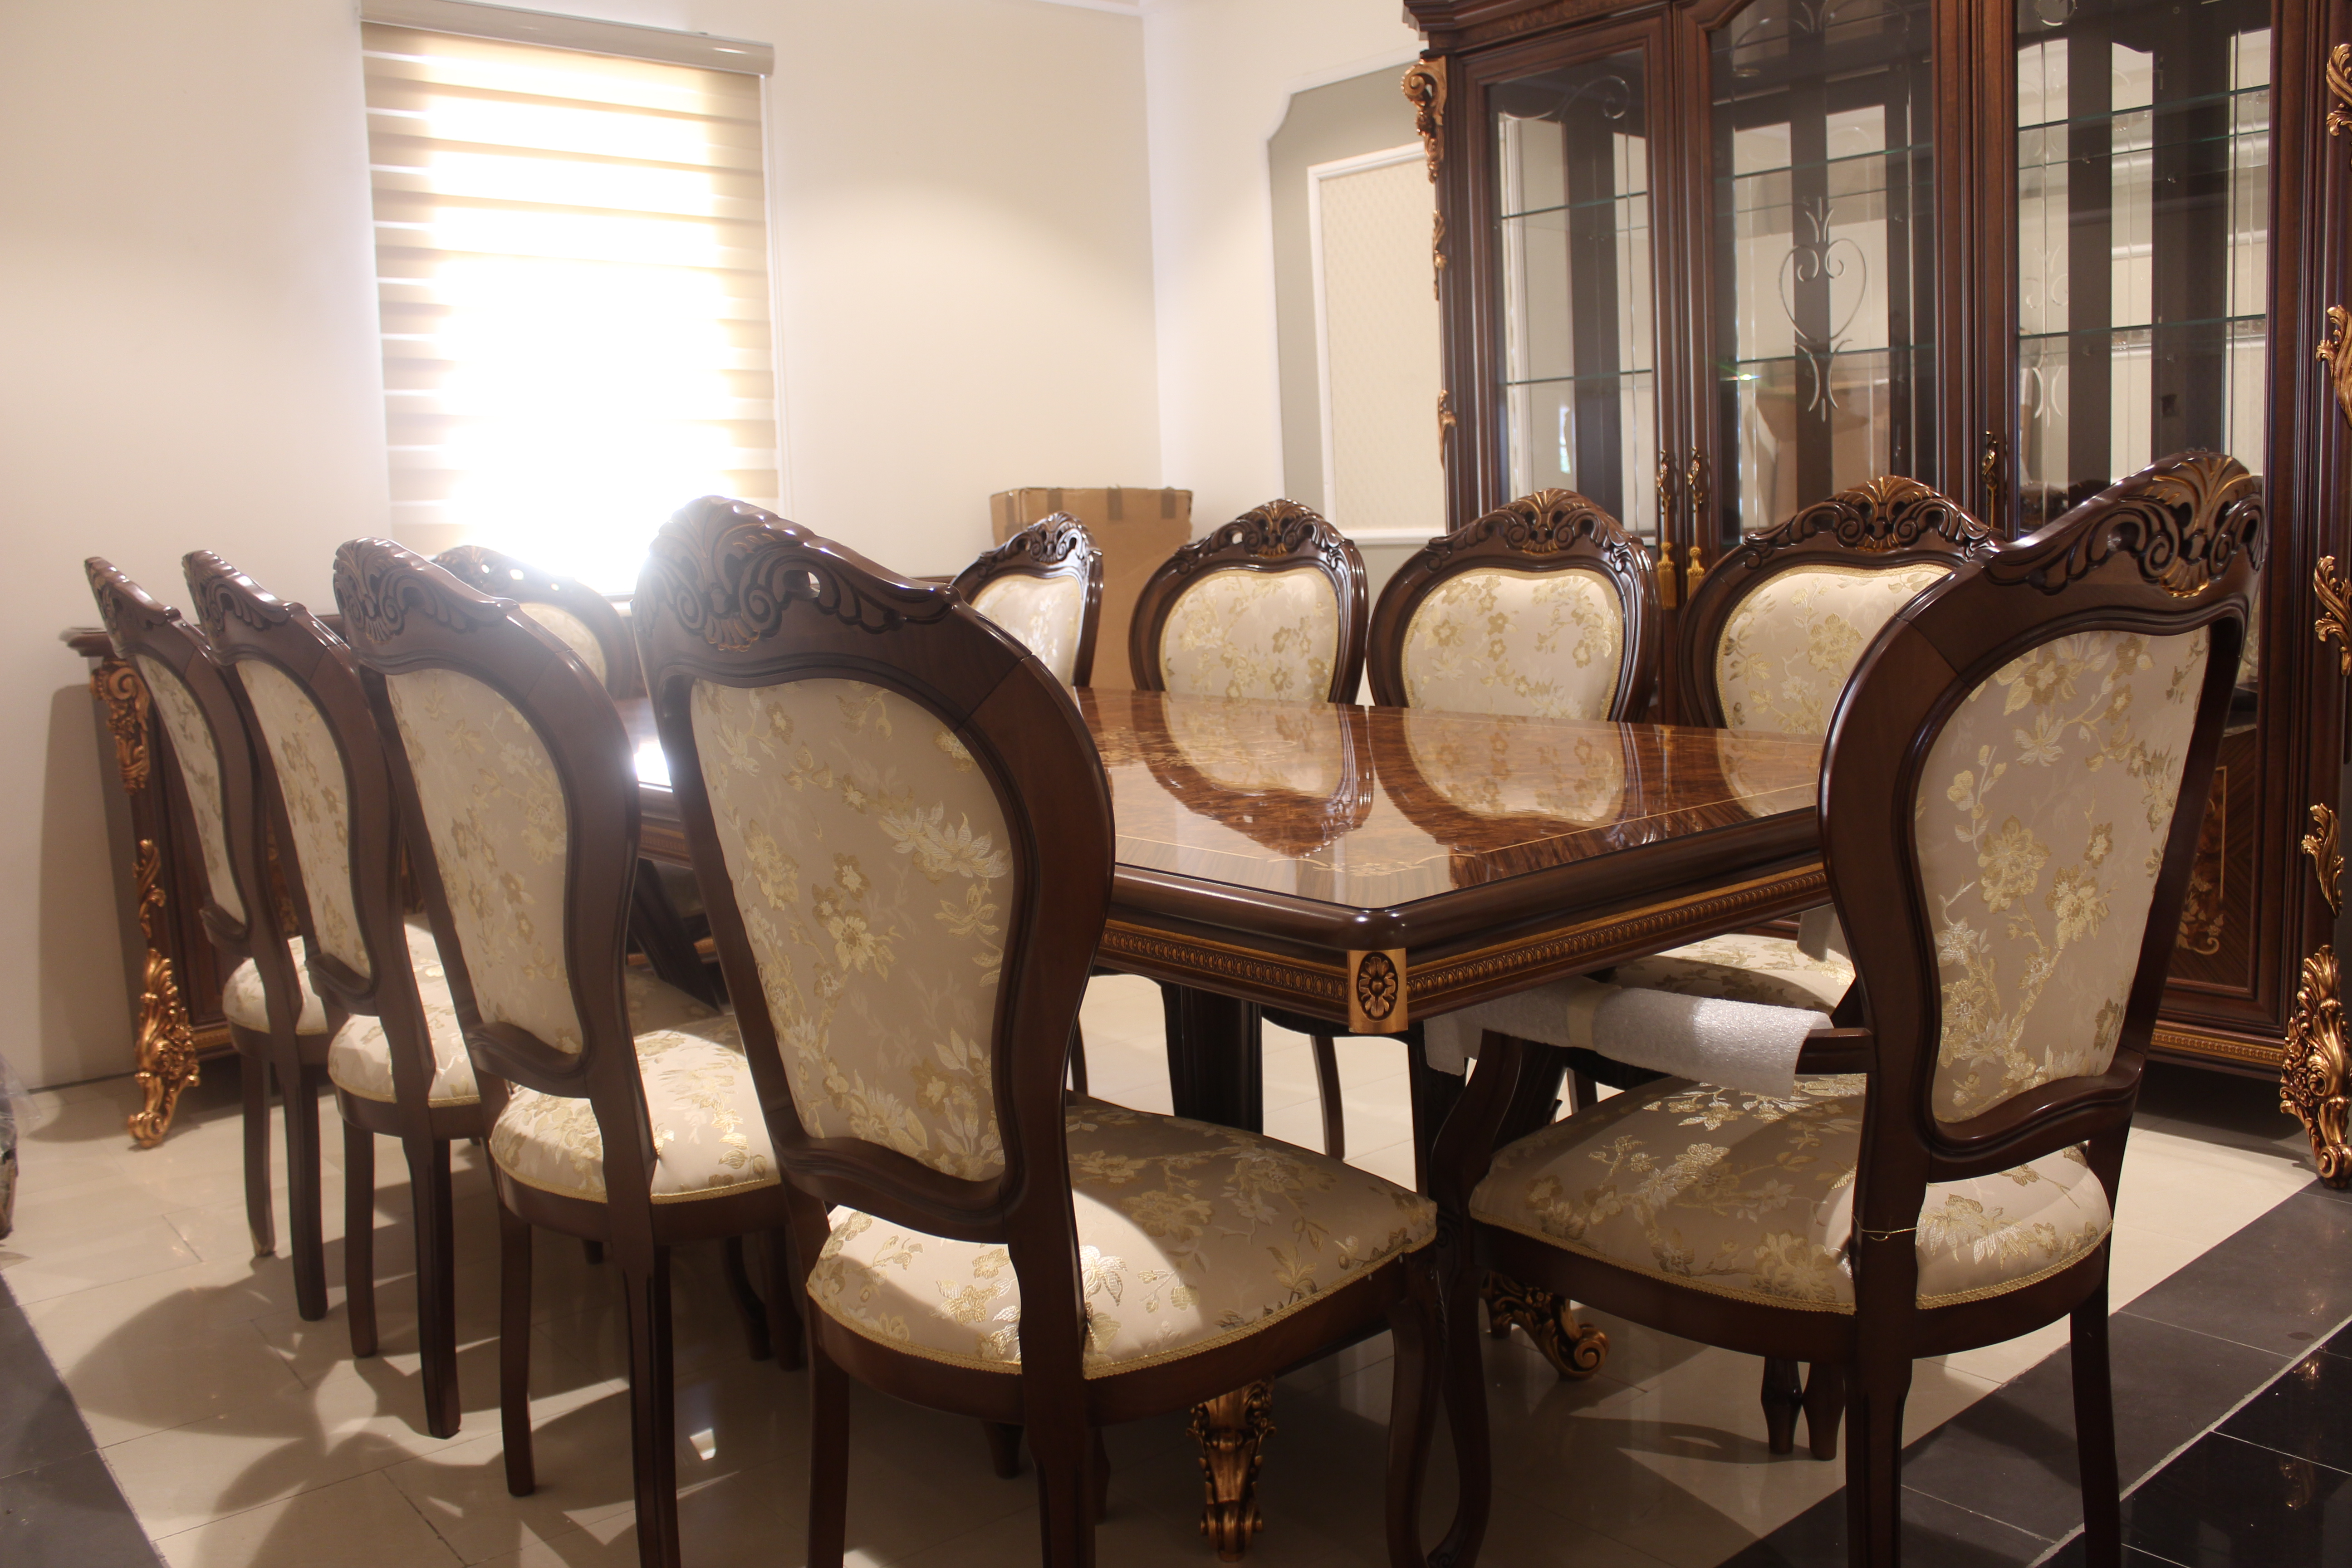 s dining principe travels bahia tag grand room ambar jw